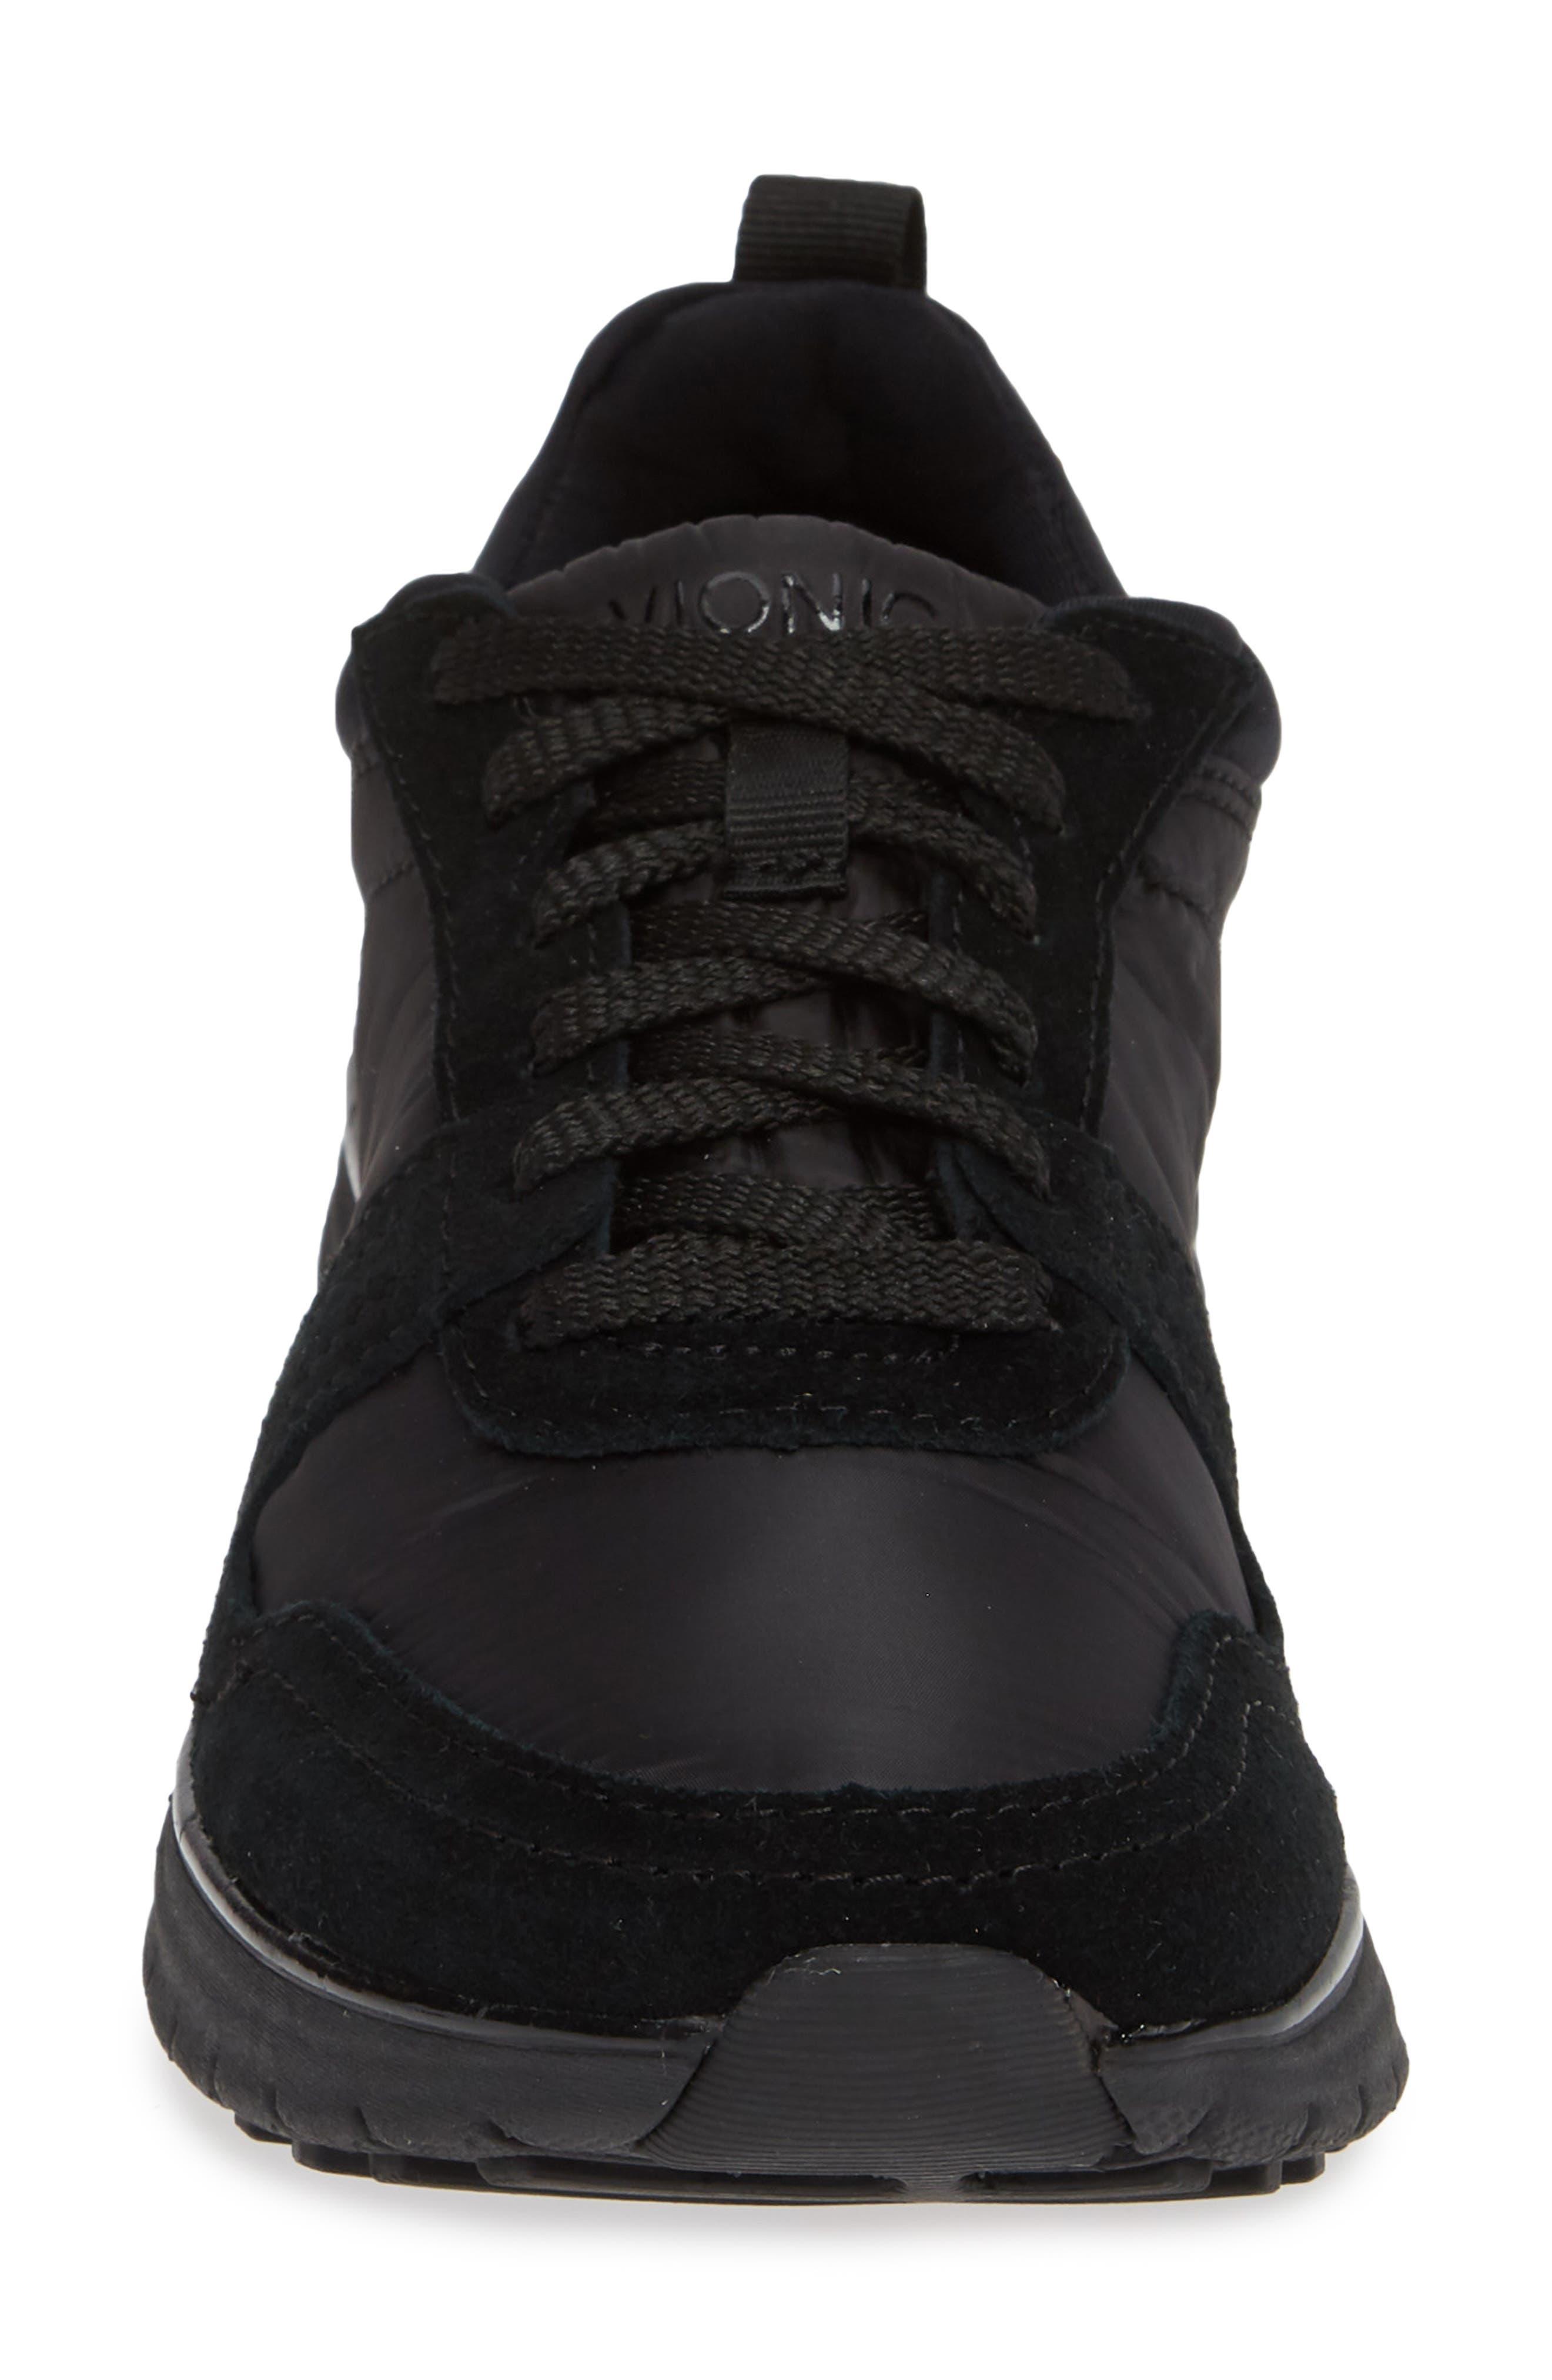 VIONIC,                             Emerson Low Top Sneaker,                             Alternate thumbnail 4, color,                             001